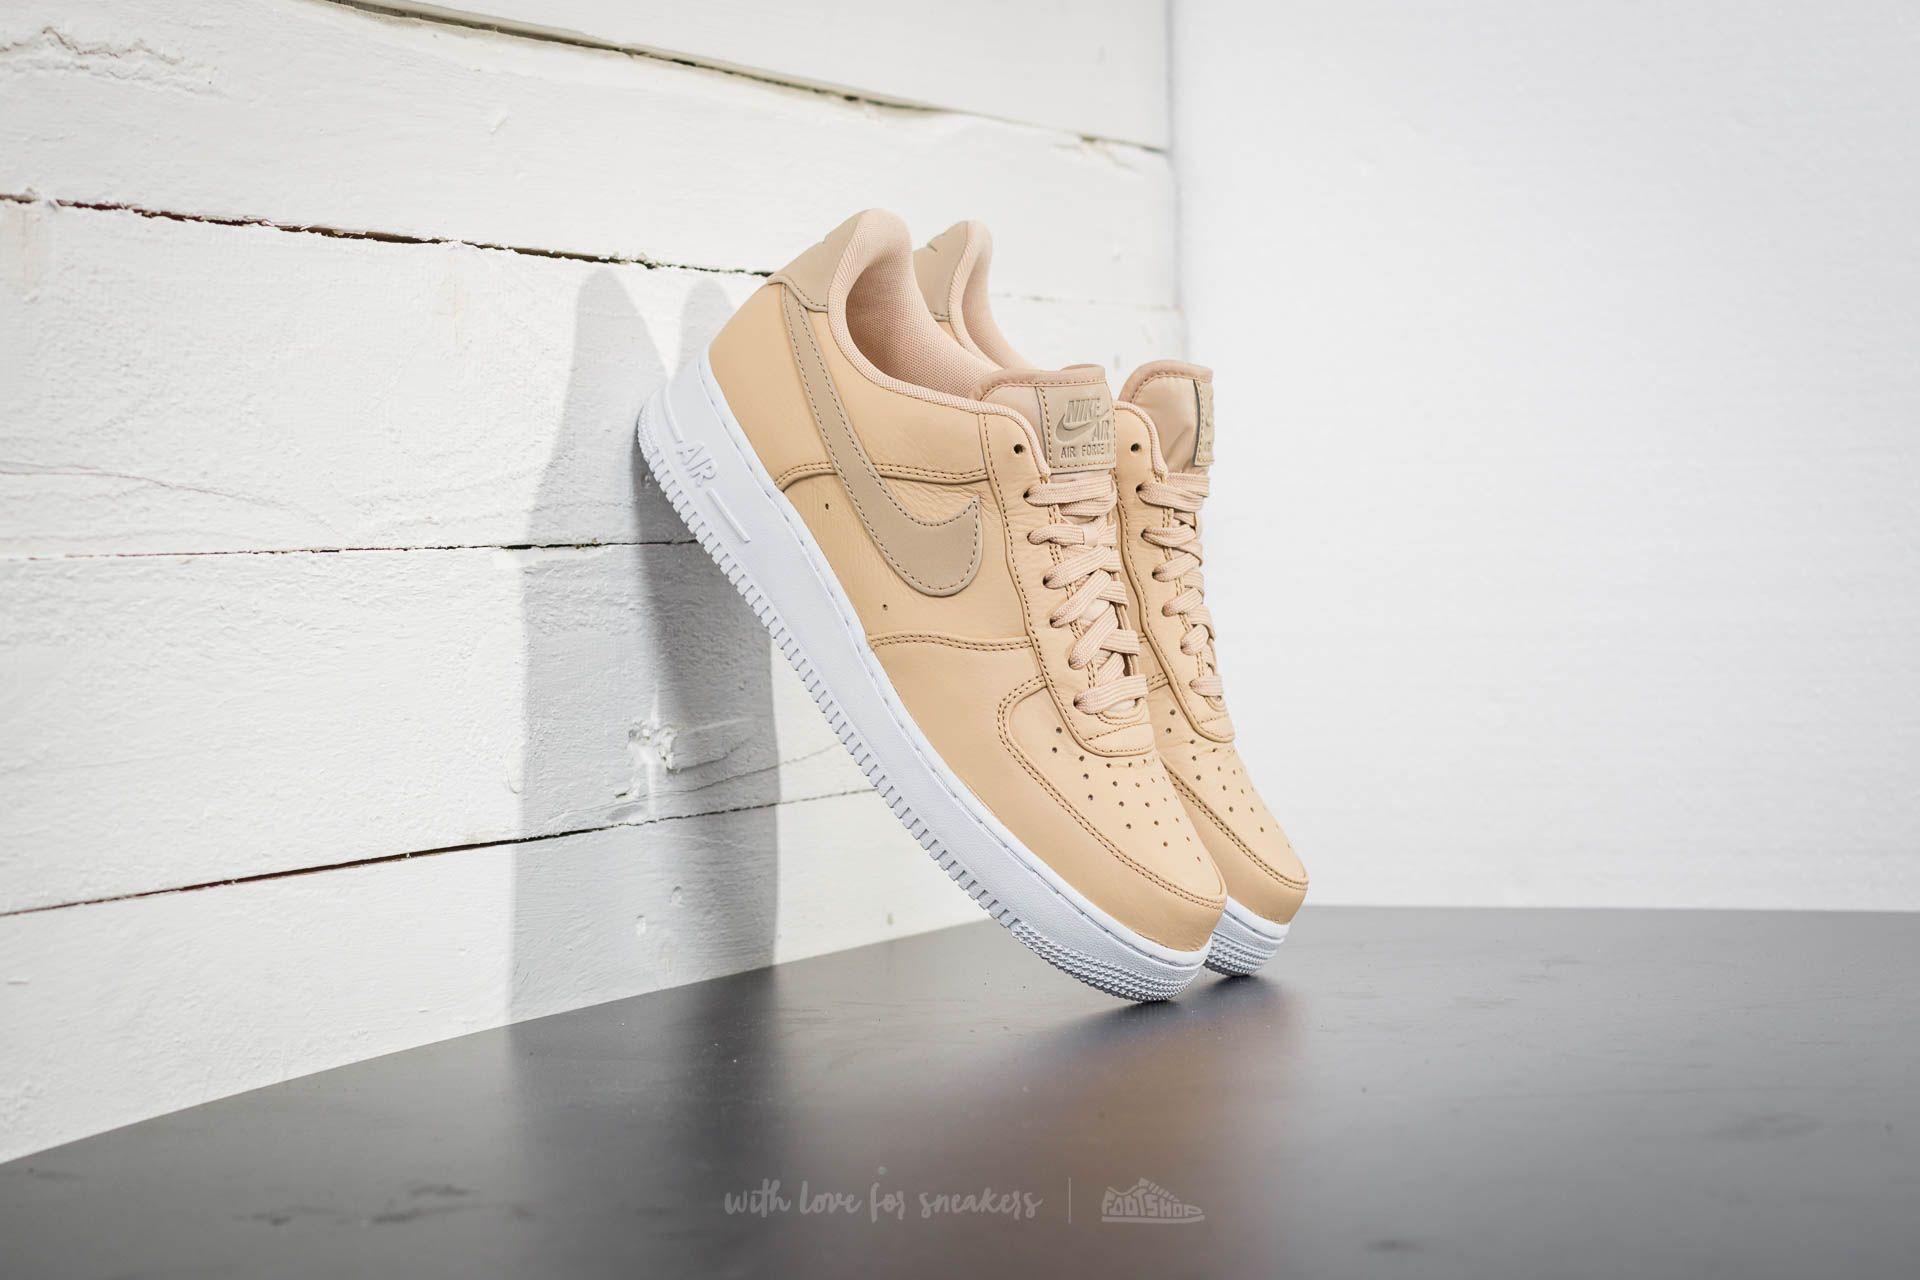 newest 37cd5 526f8 Nike Air Force 1 ´07 Premium Vachetta Tan/ Vachetta Tan | Footshop